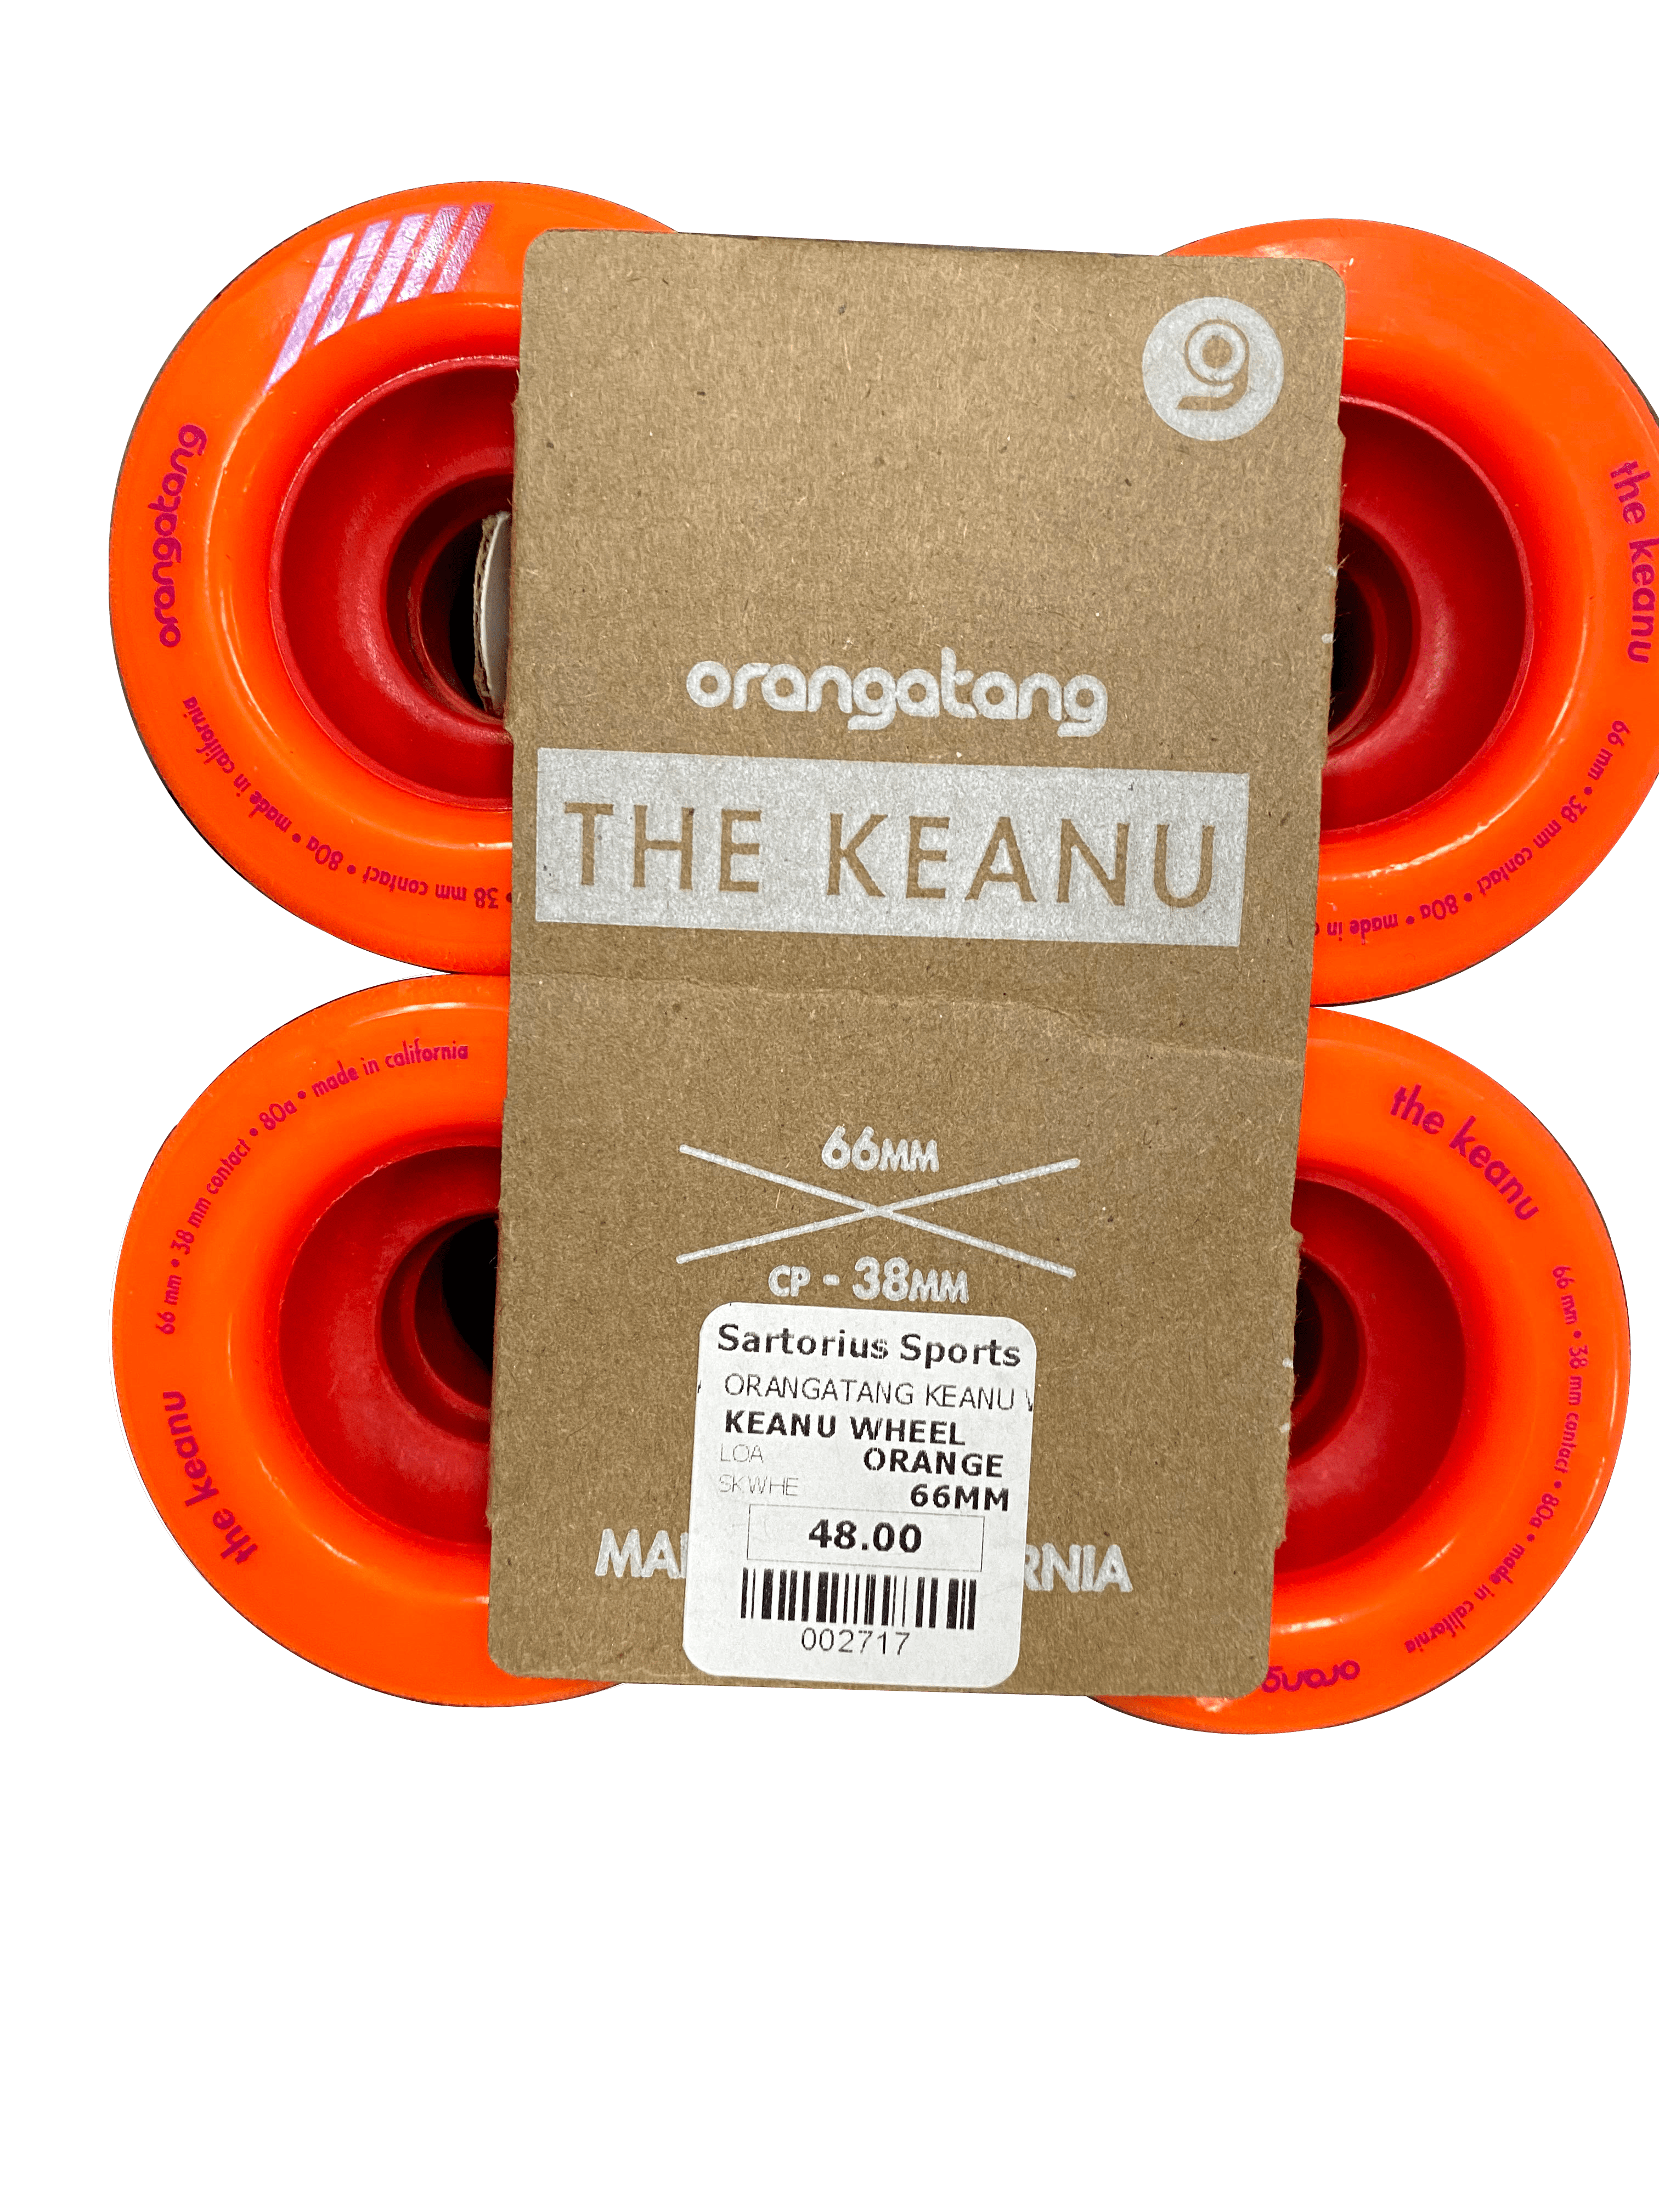 Orangutang-Keanu,-2717,-66MM,-$47